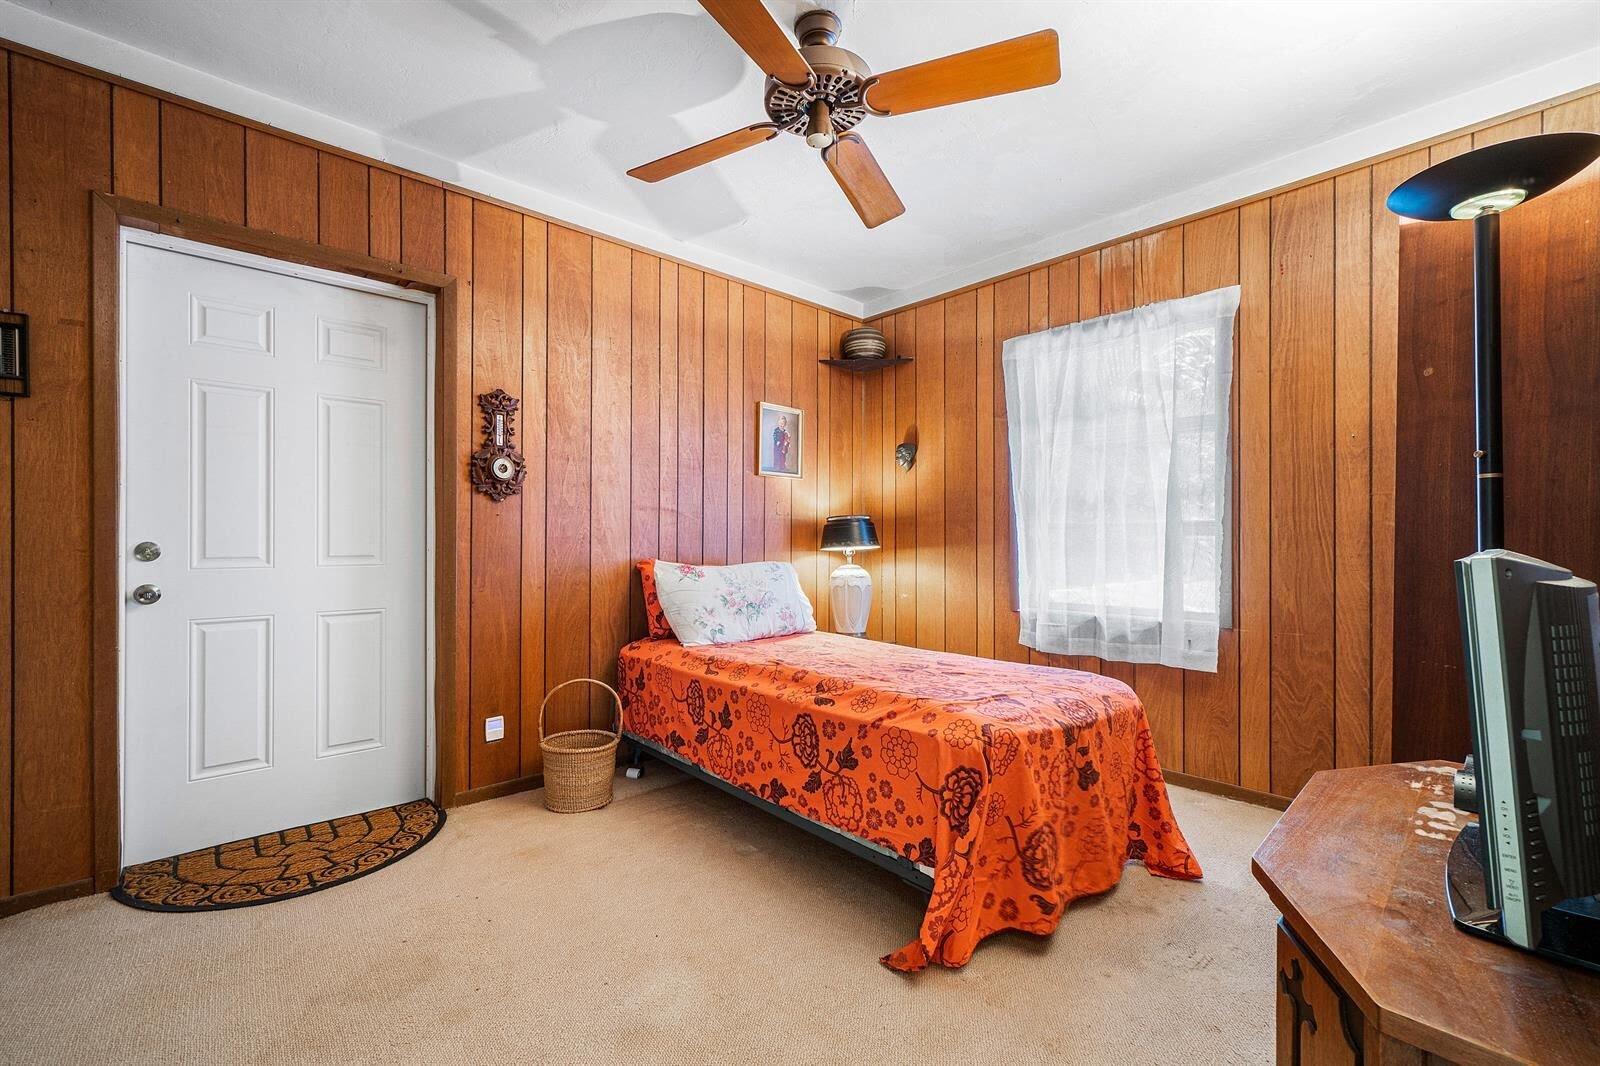 417 NE 23rd Ave Pompano Beach, FL 33062